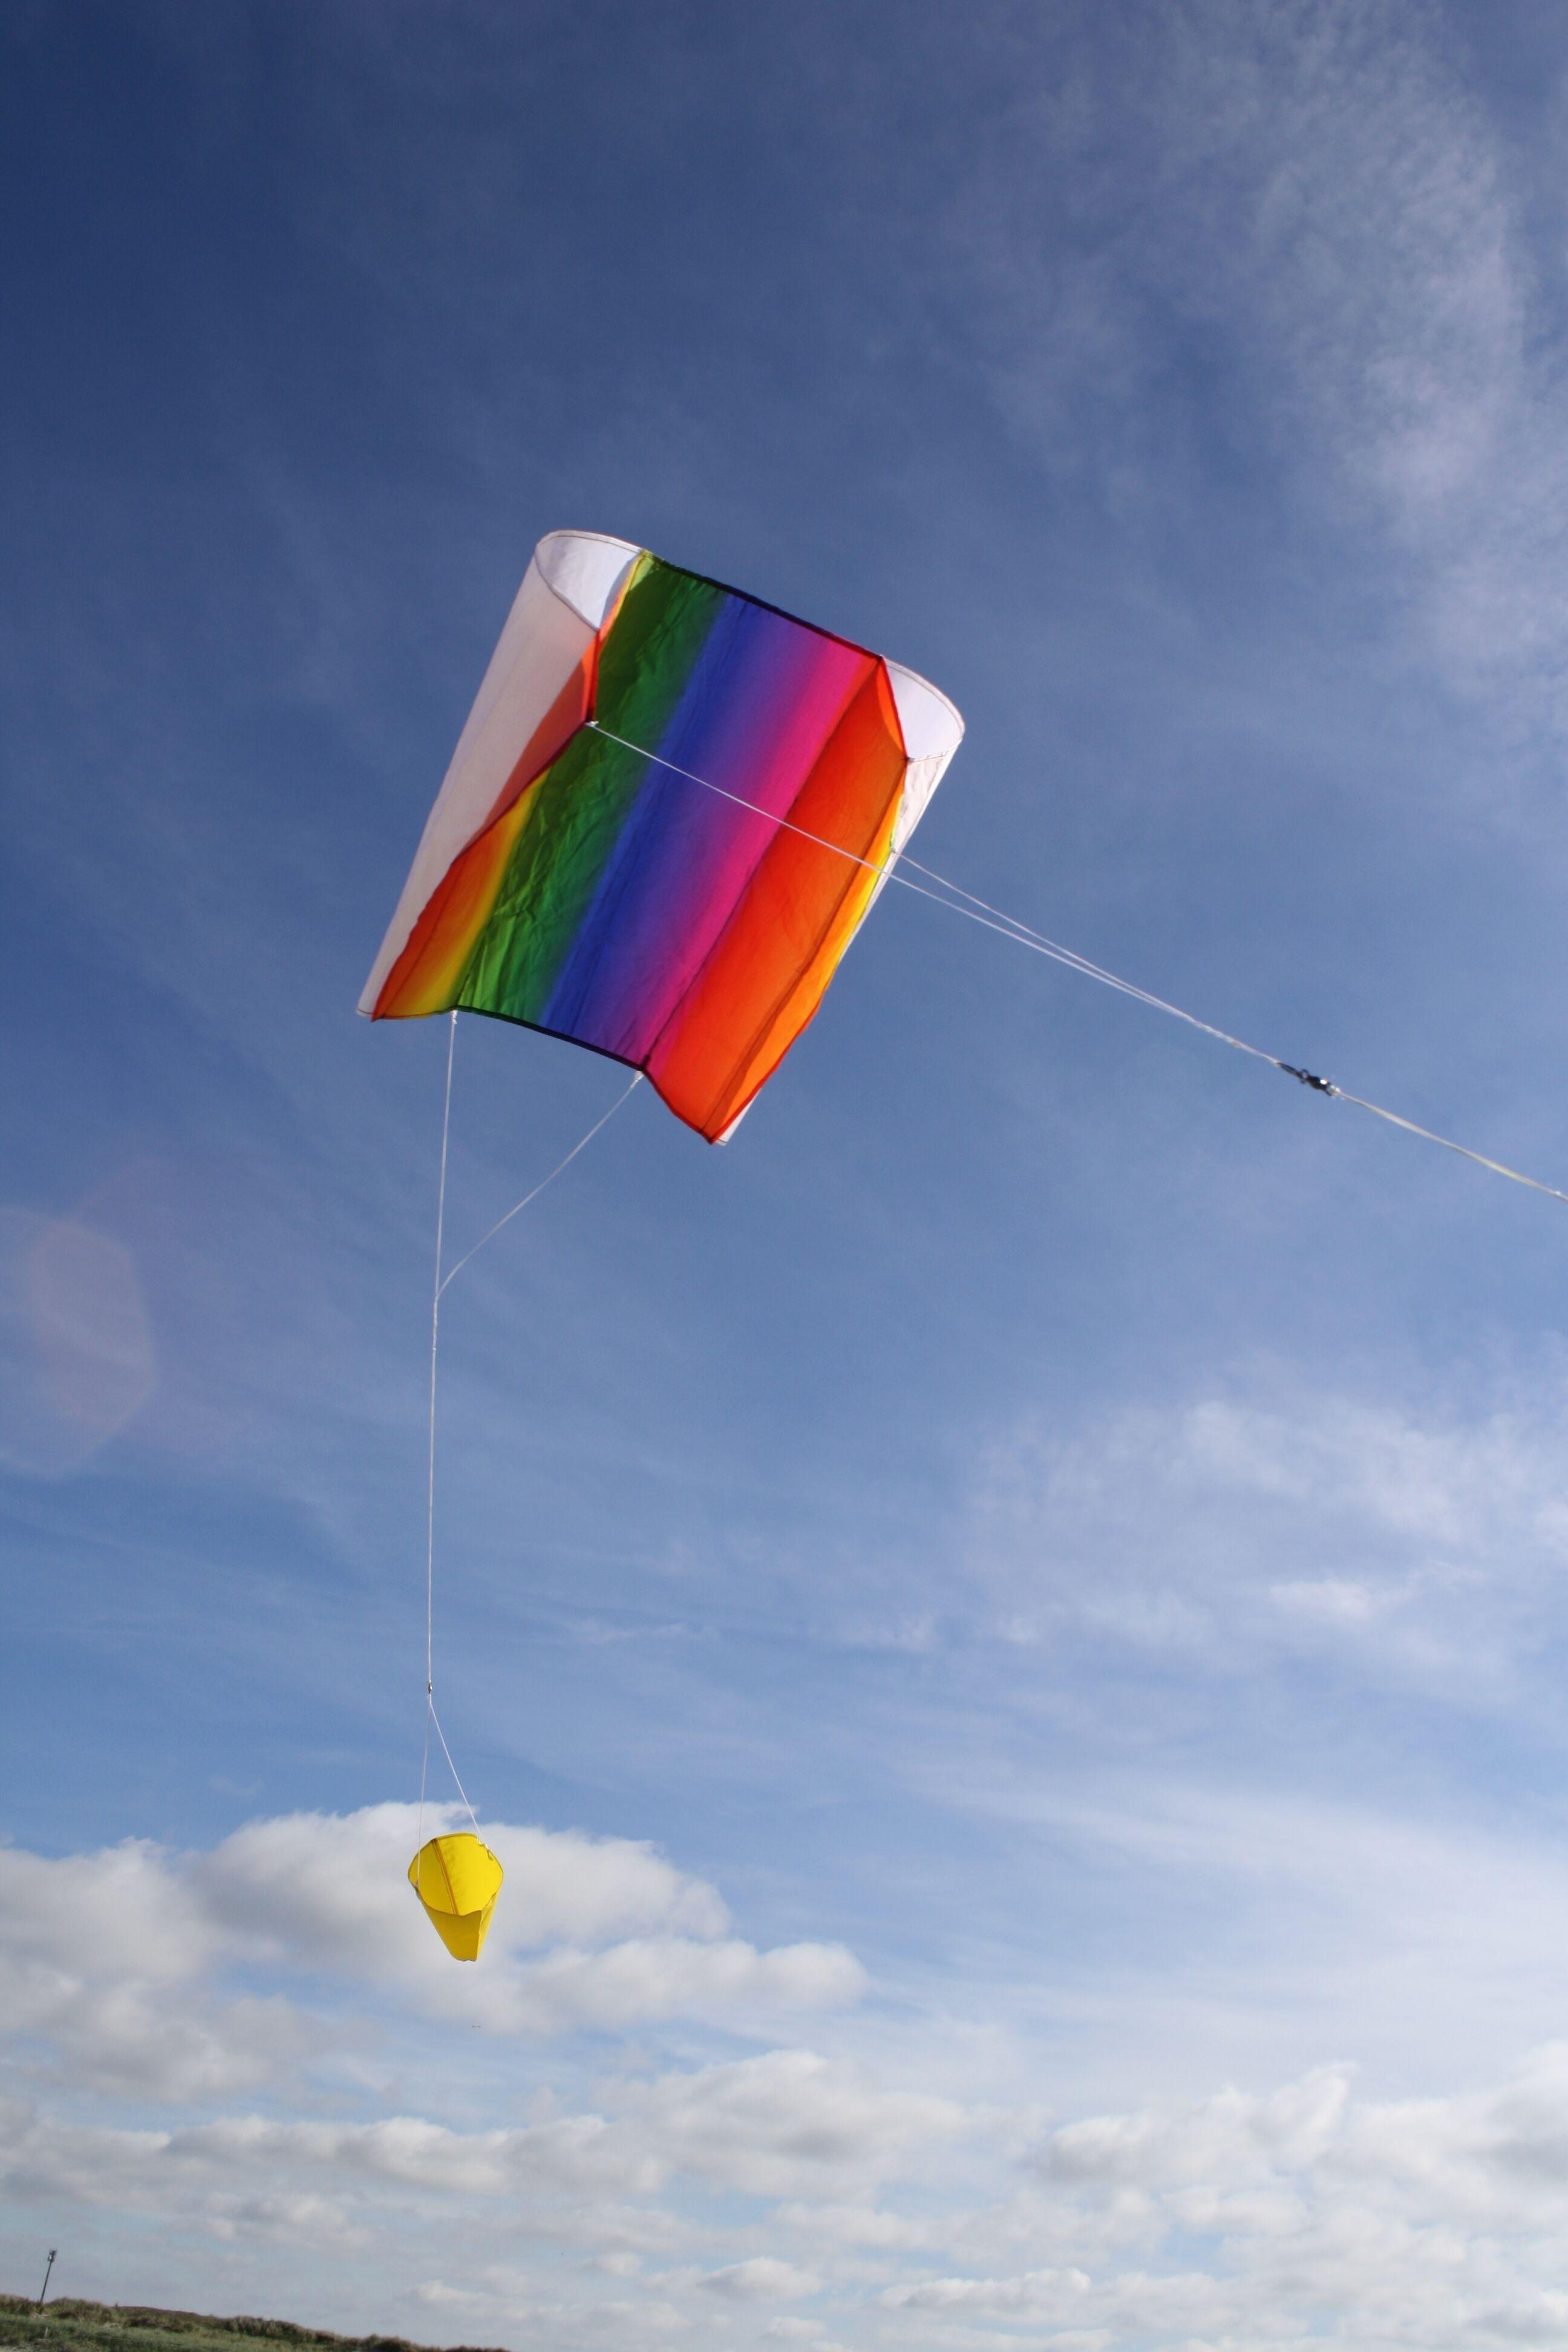 Wolkensturmer | Sled Kite - Rainbow